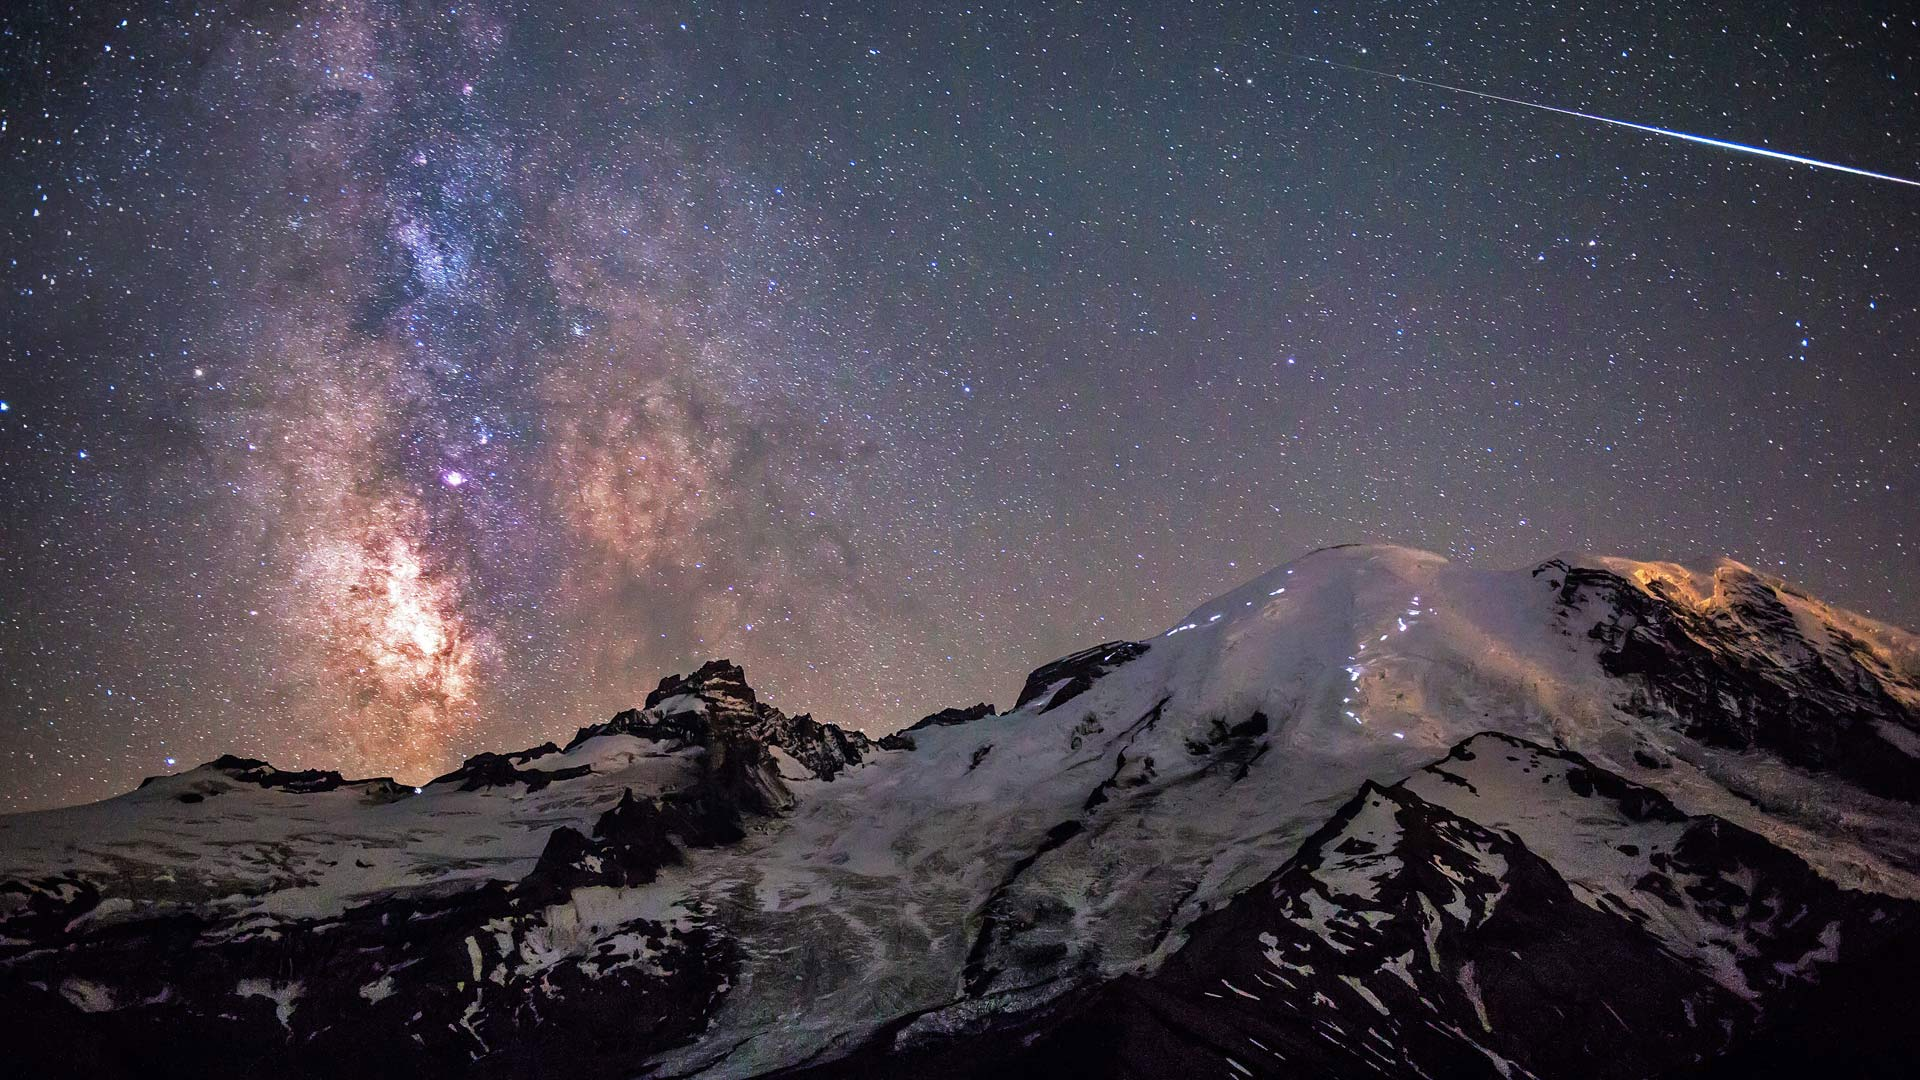 Milky Way above Mount Rainier in Mount Rainier National Park, Washington (© Brad Goldpaint/Aurora Photos)